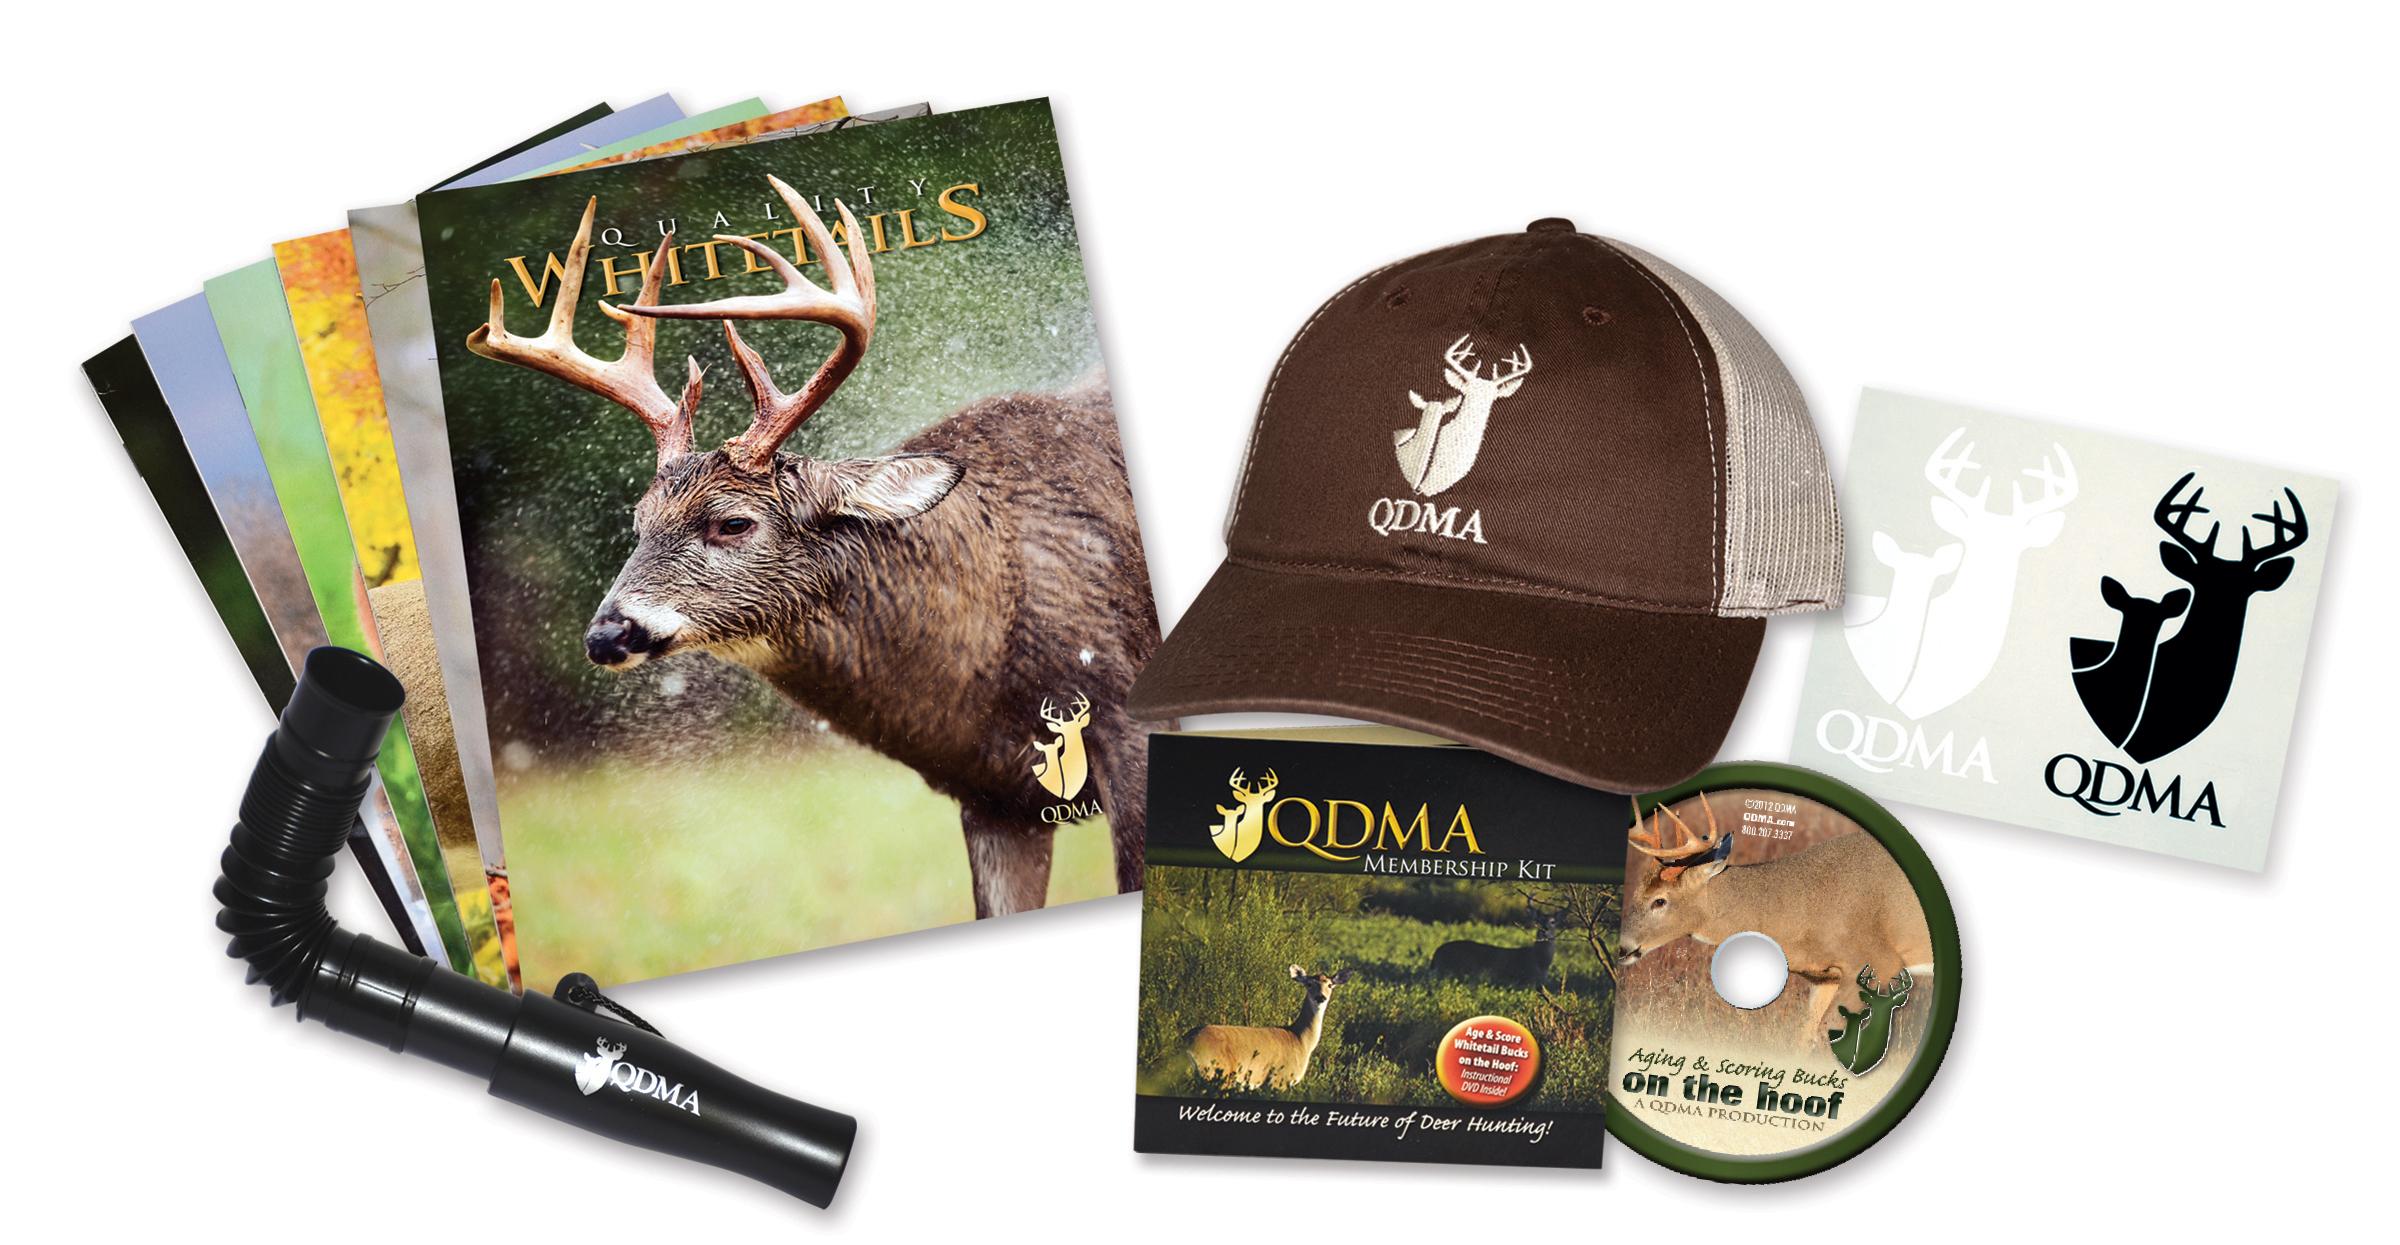 QDMA Sponsor Membership Gifts